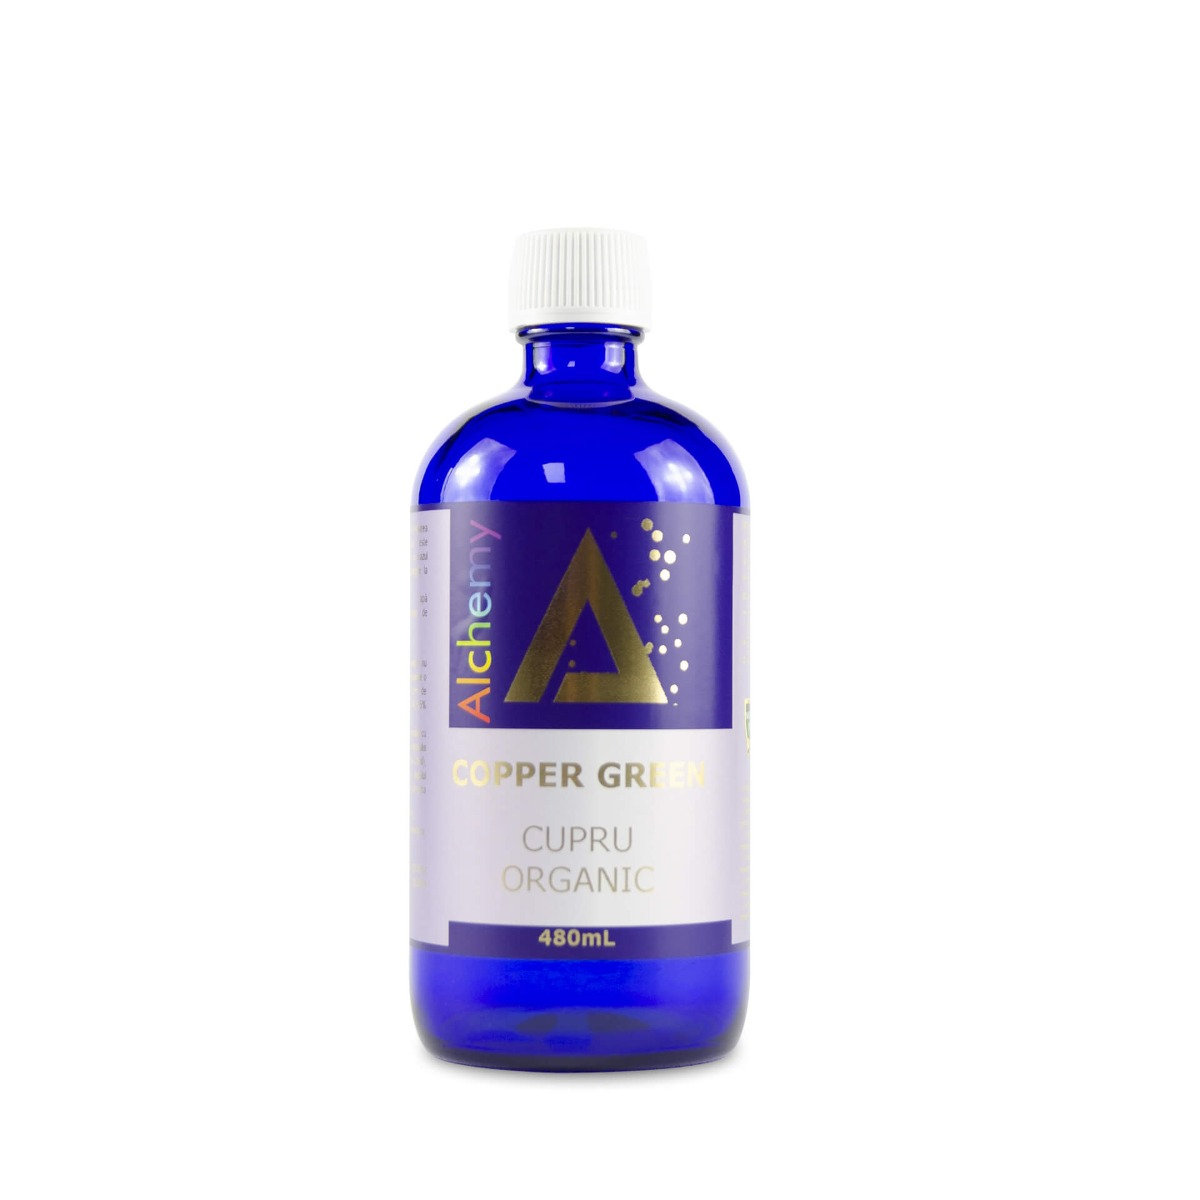 Copper Green Cupru Ionic Organic Alchemy, 480ml, Aghoras drmax.ro